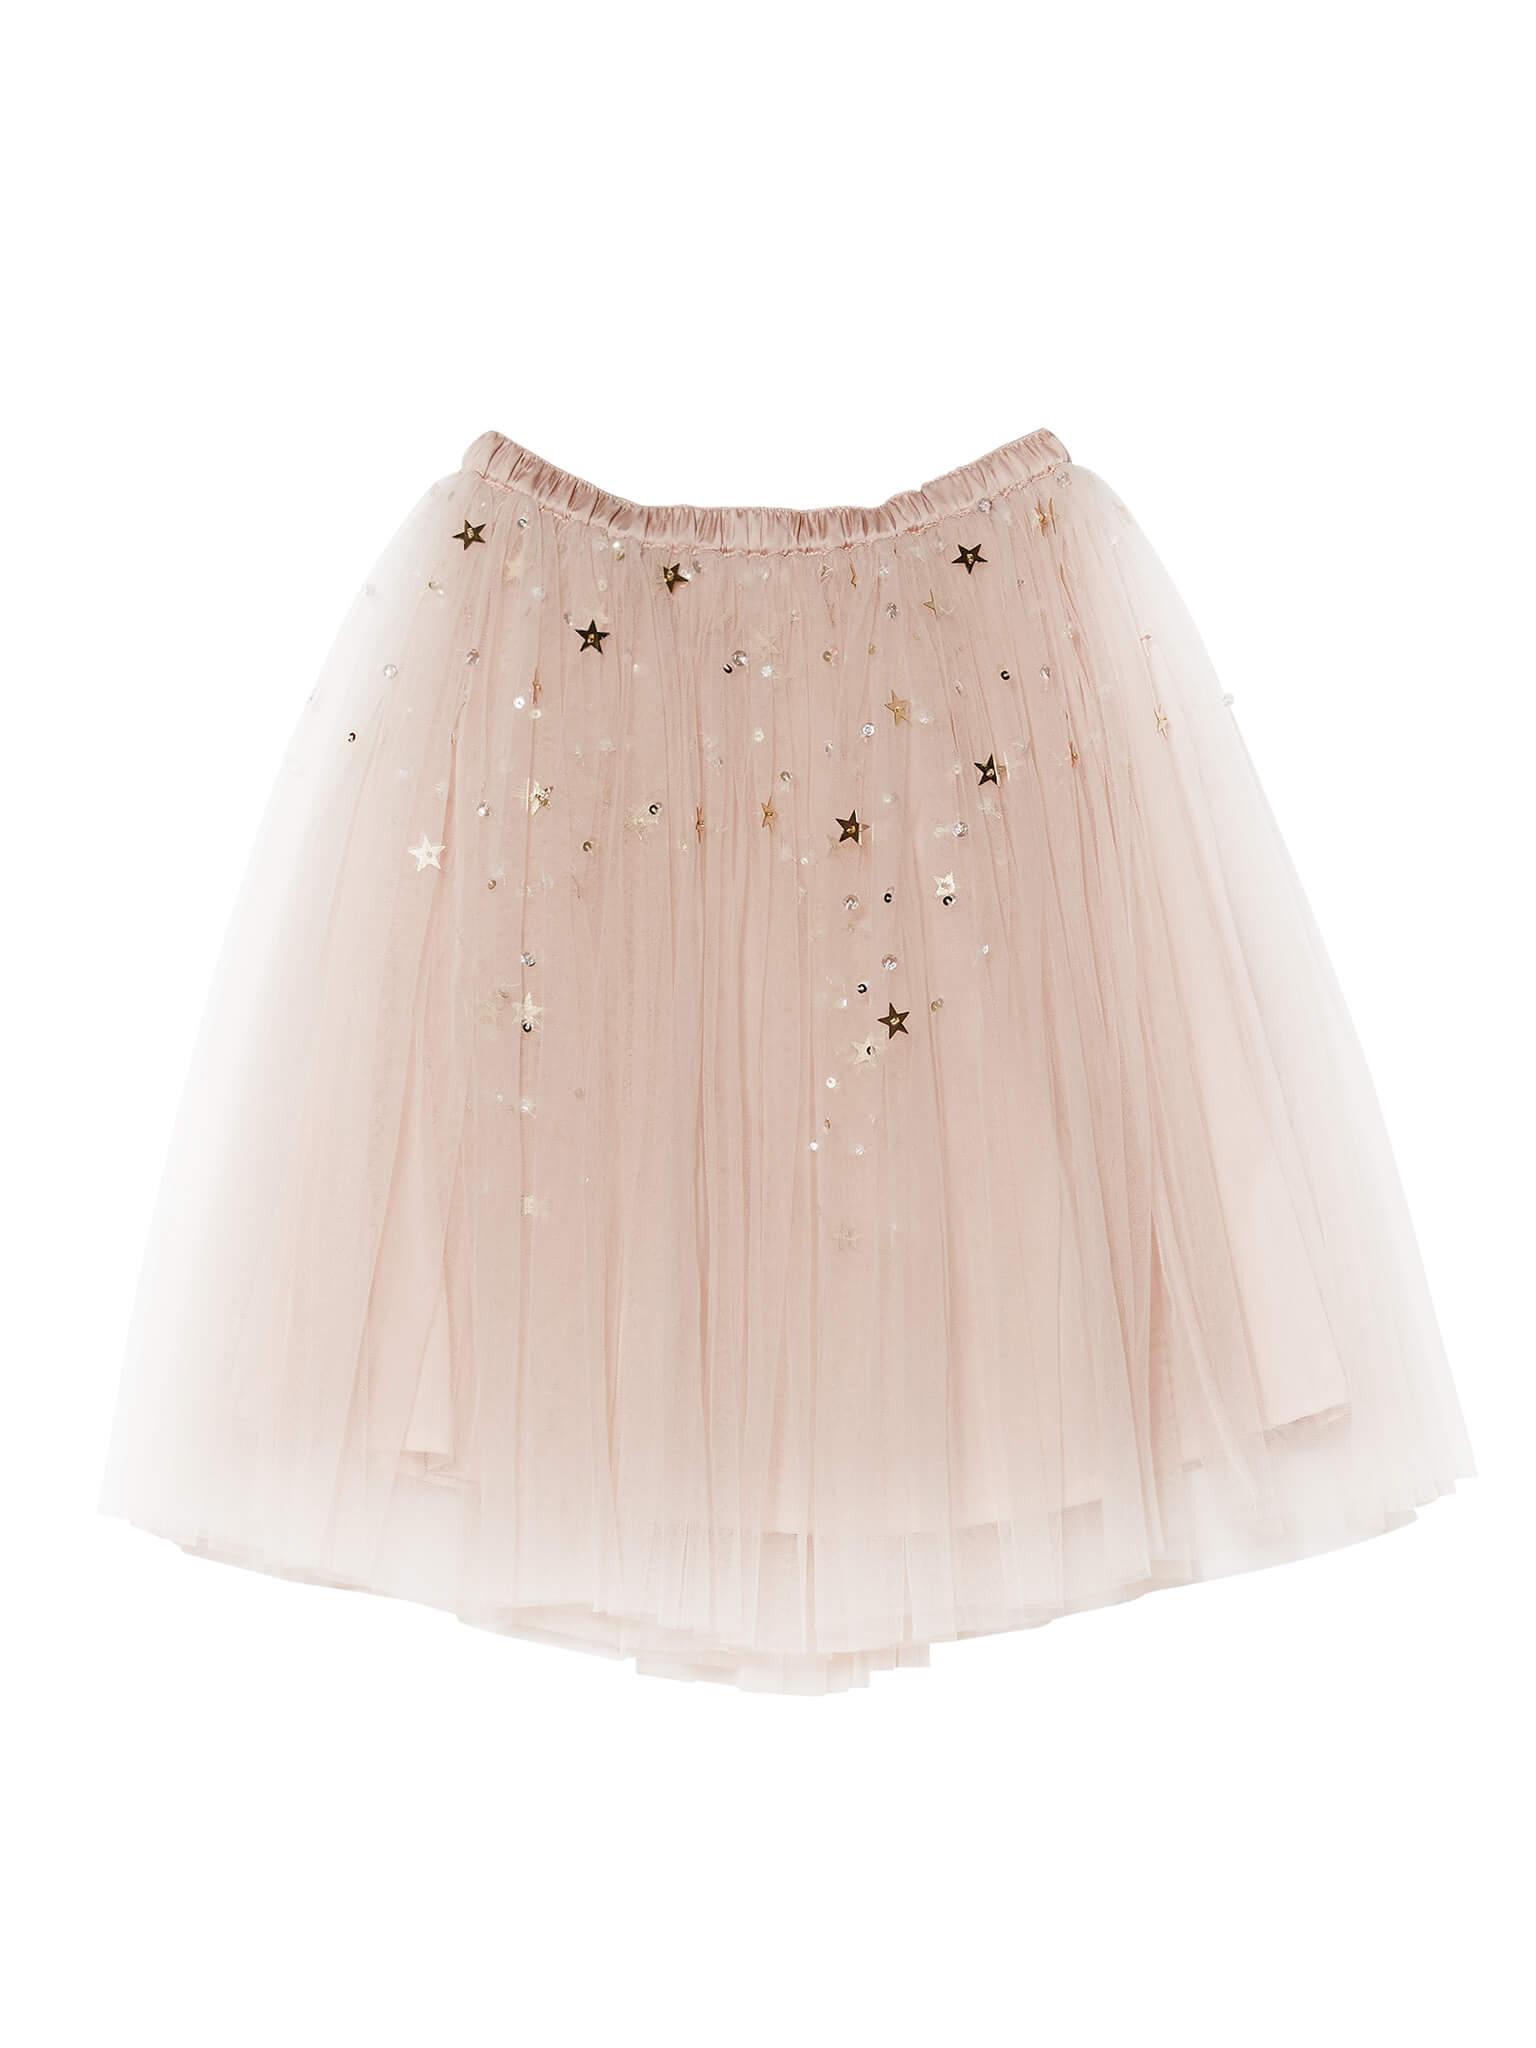 Tdm4133 mirror mirror tutu skirt 01